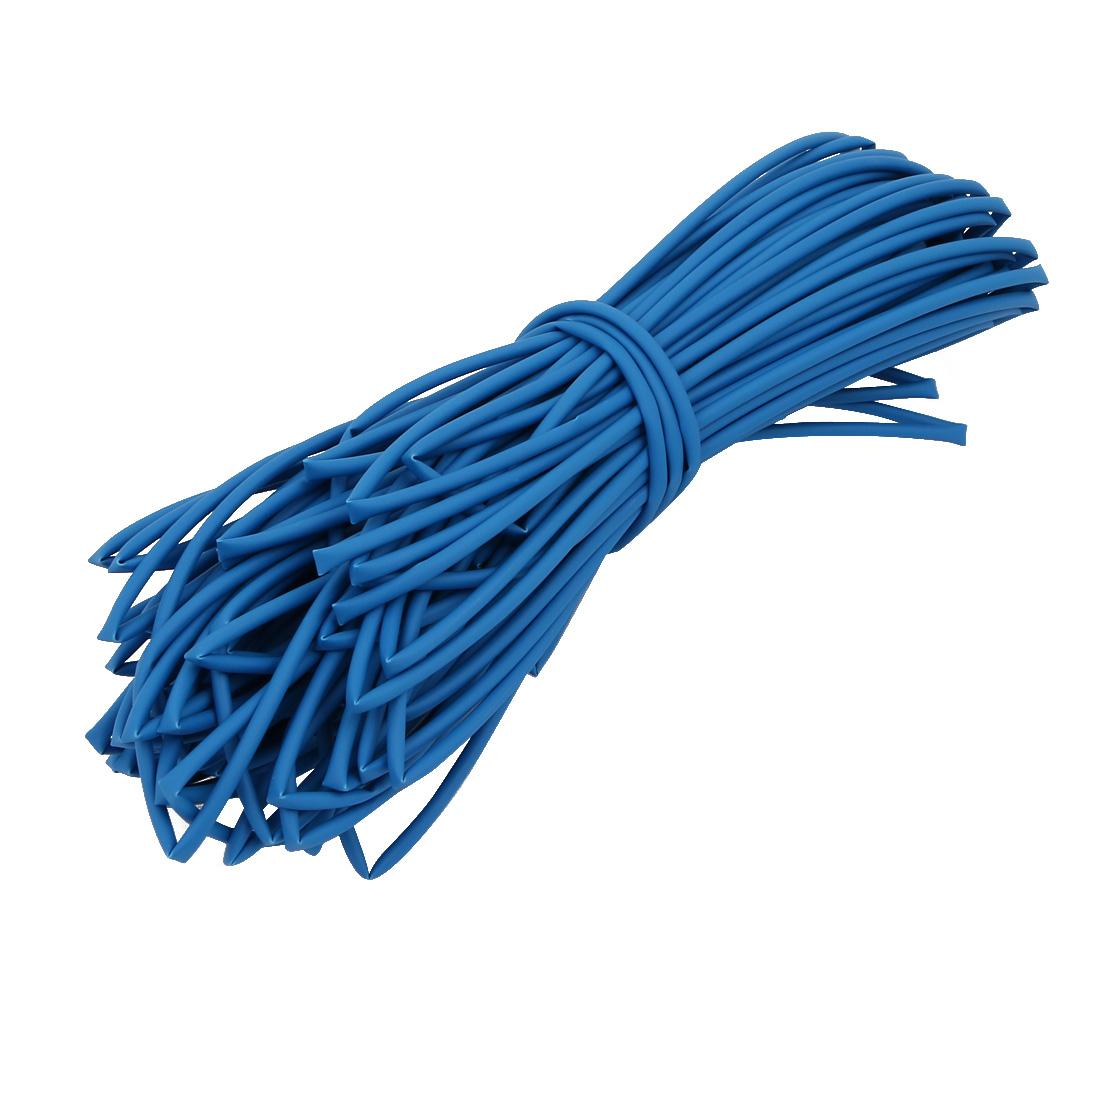 25M 0.08in Inner Dia Polyolefin Flame Retardant Tube Blue for Wire Repairing